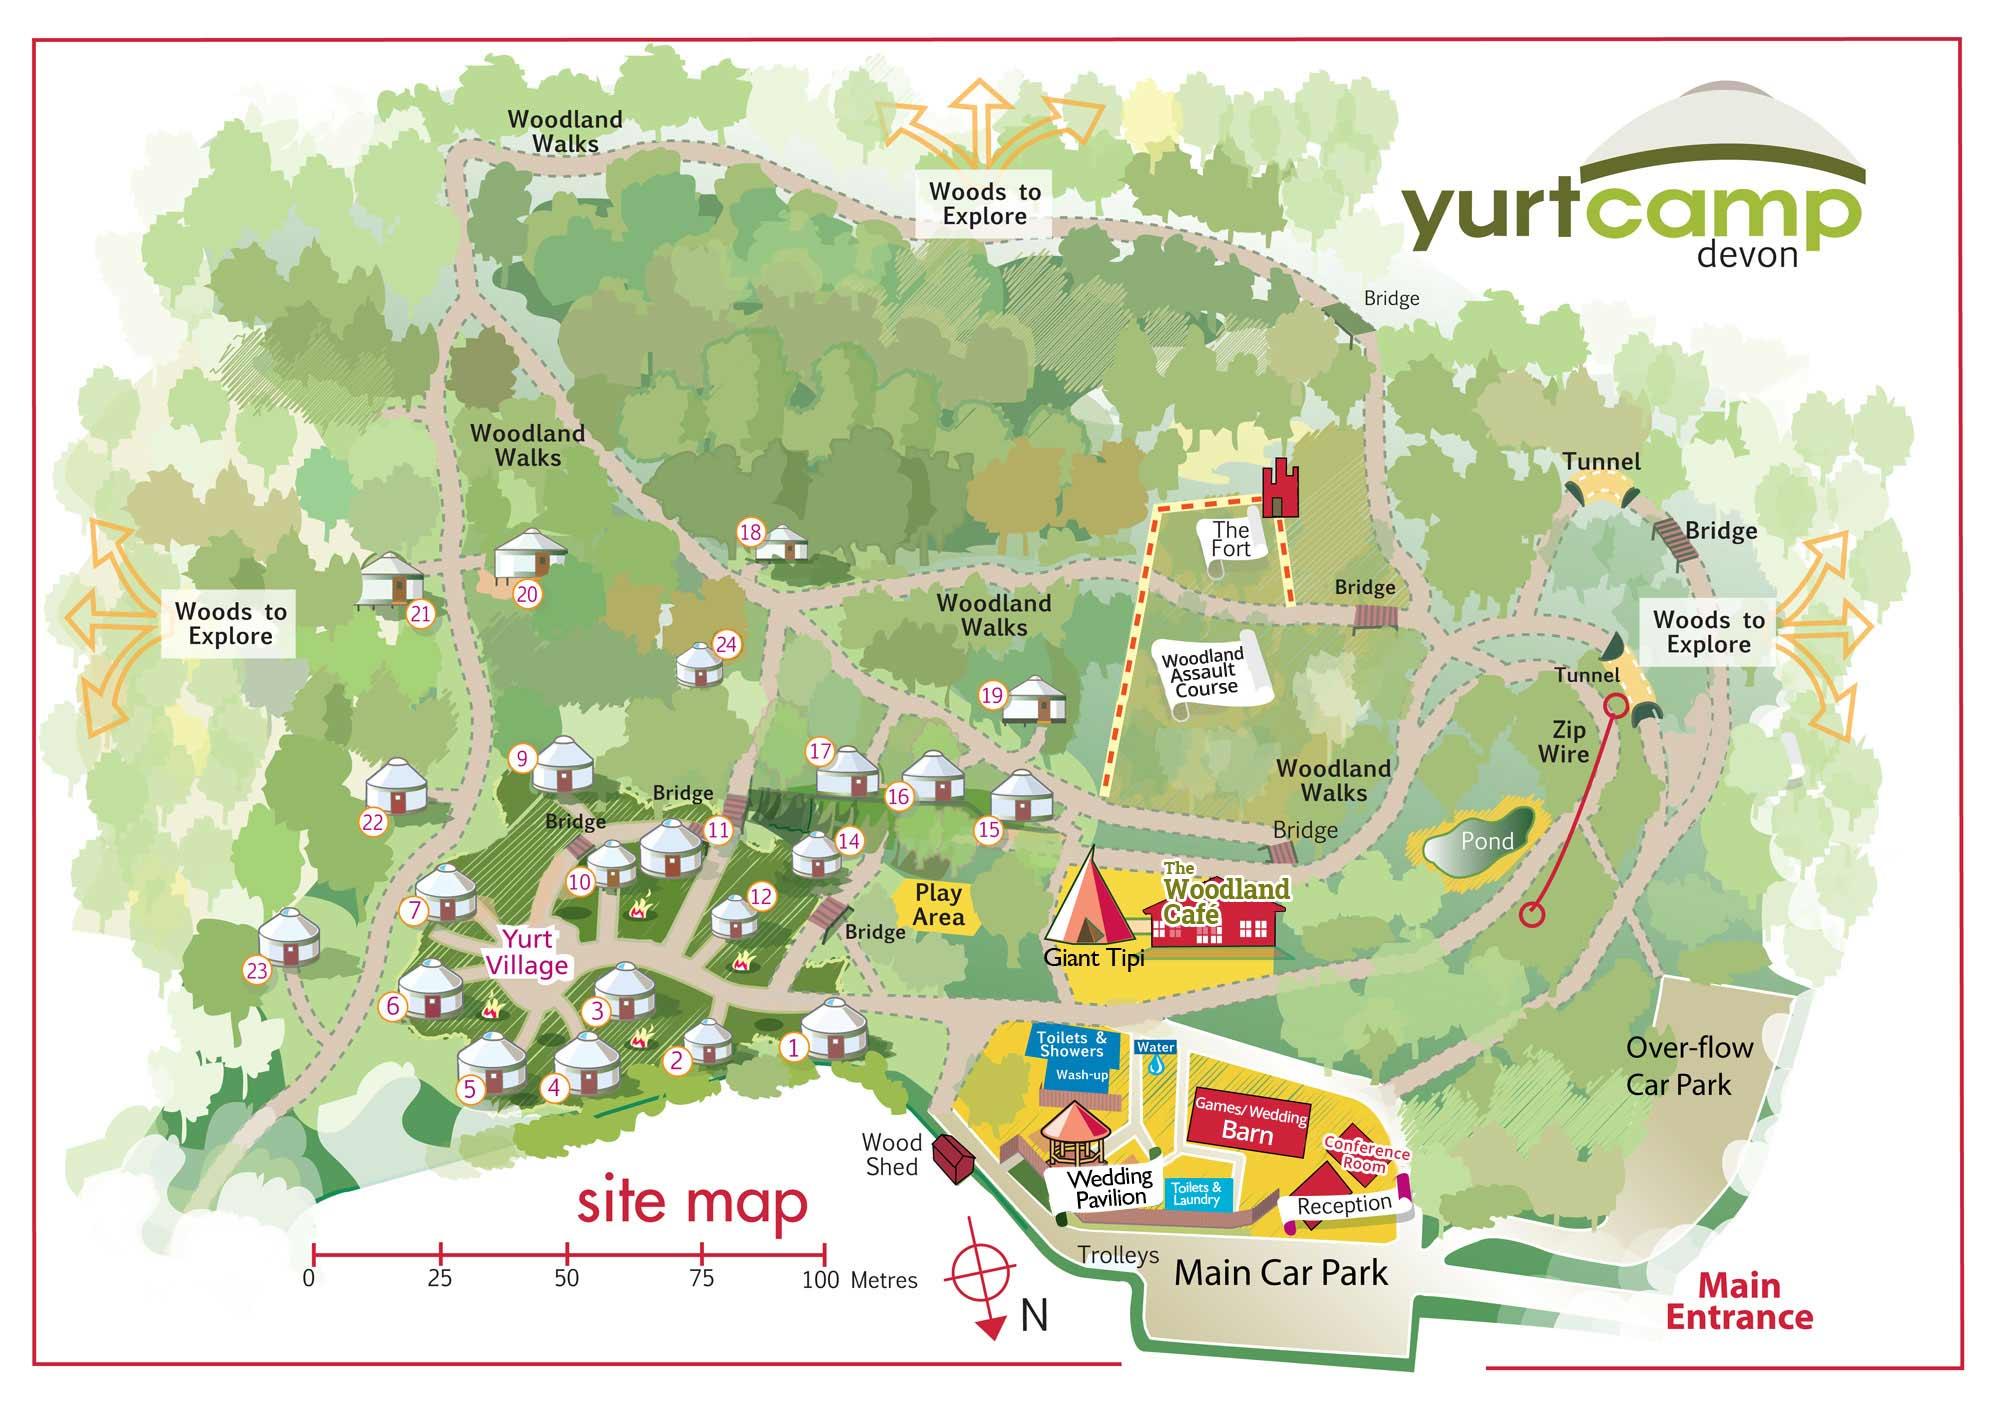 Yurtcamp Map